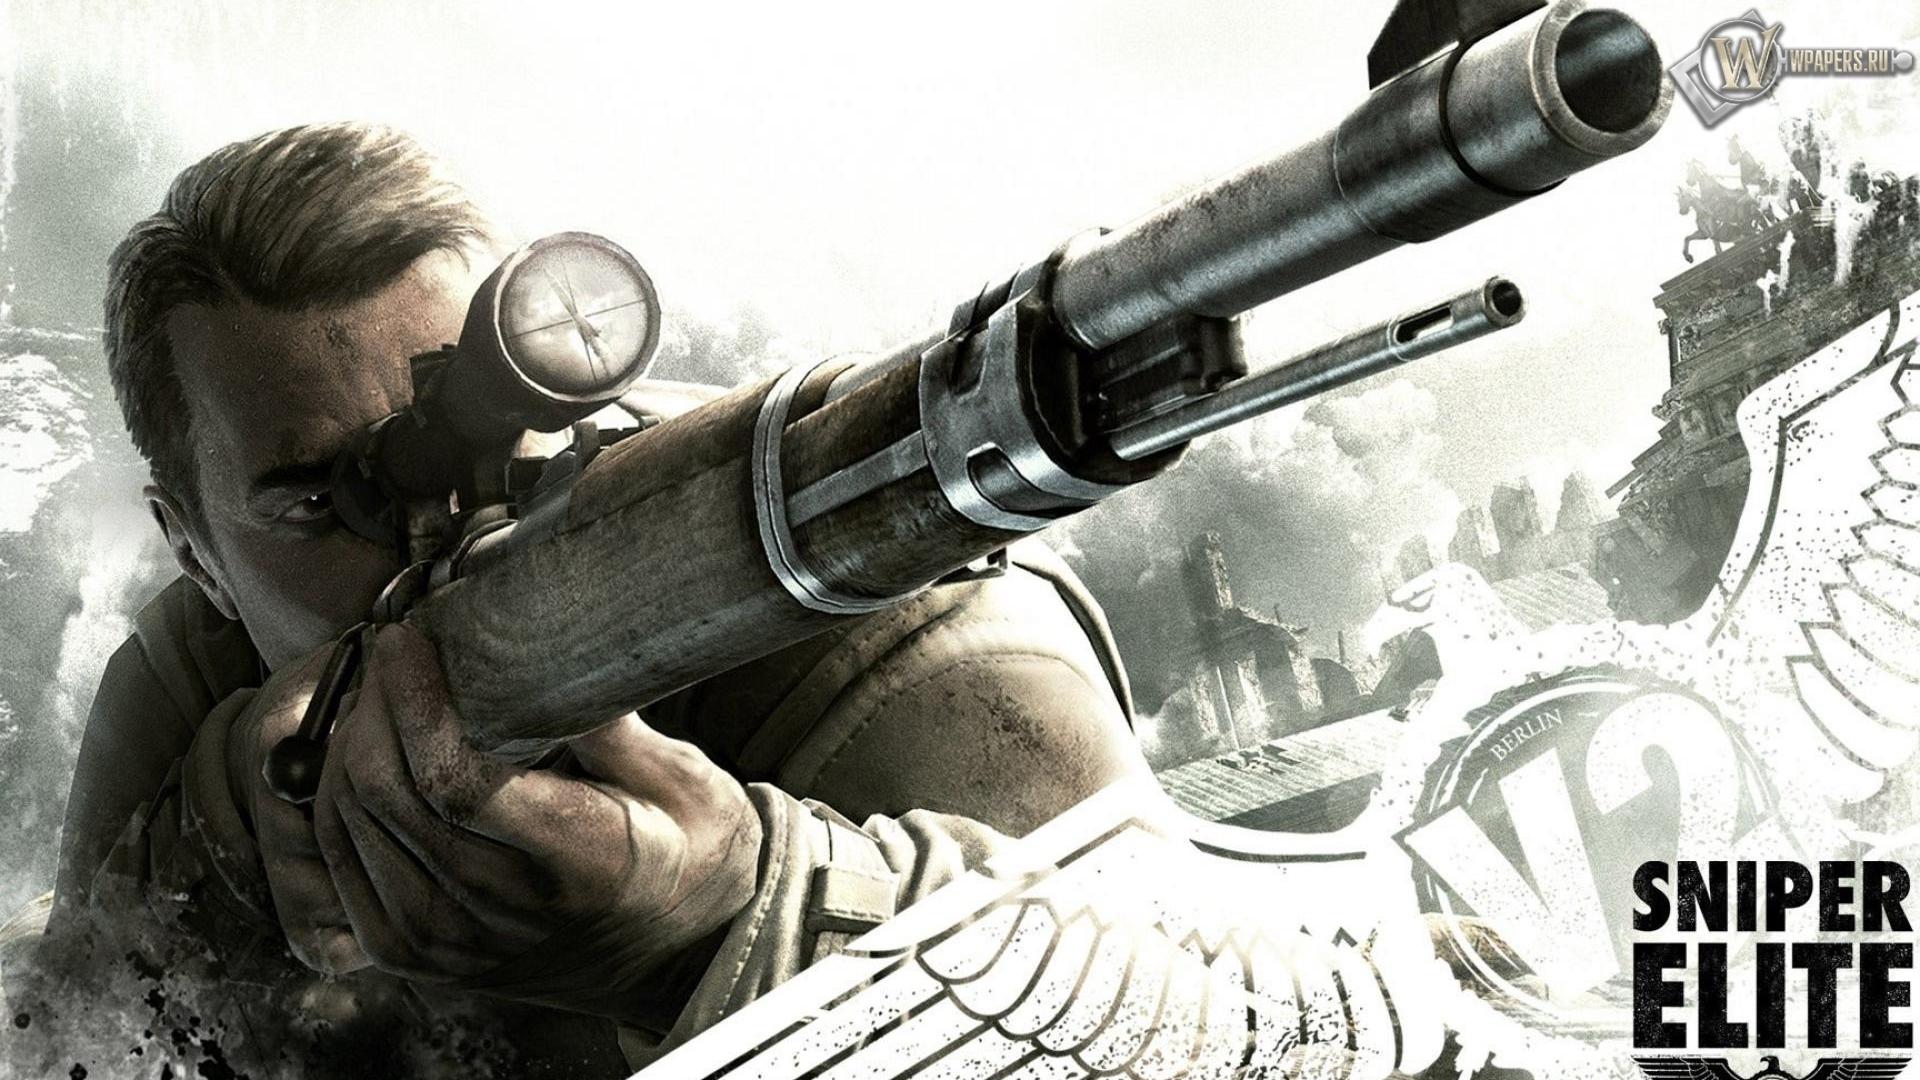 D3d11.Dll Для Sniper Elite V2 Бесплатно